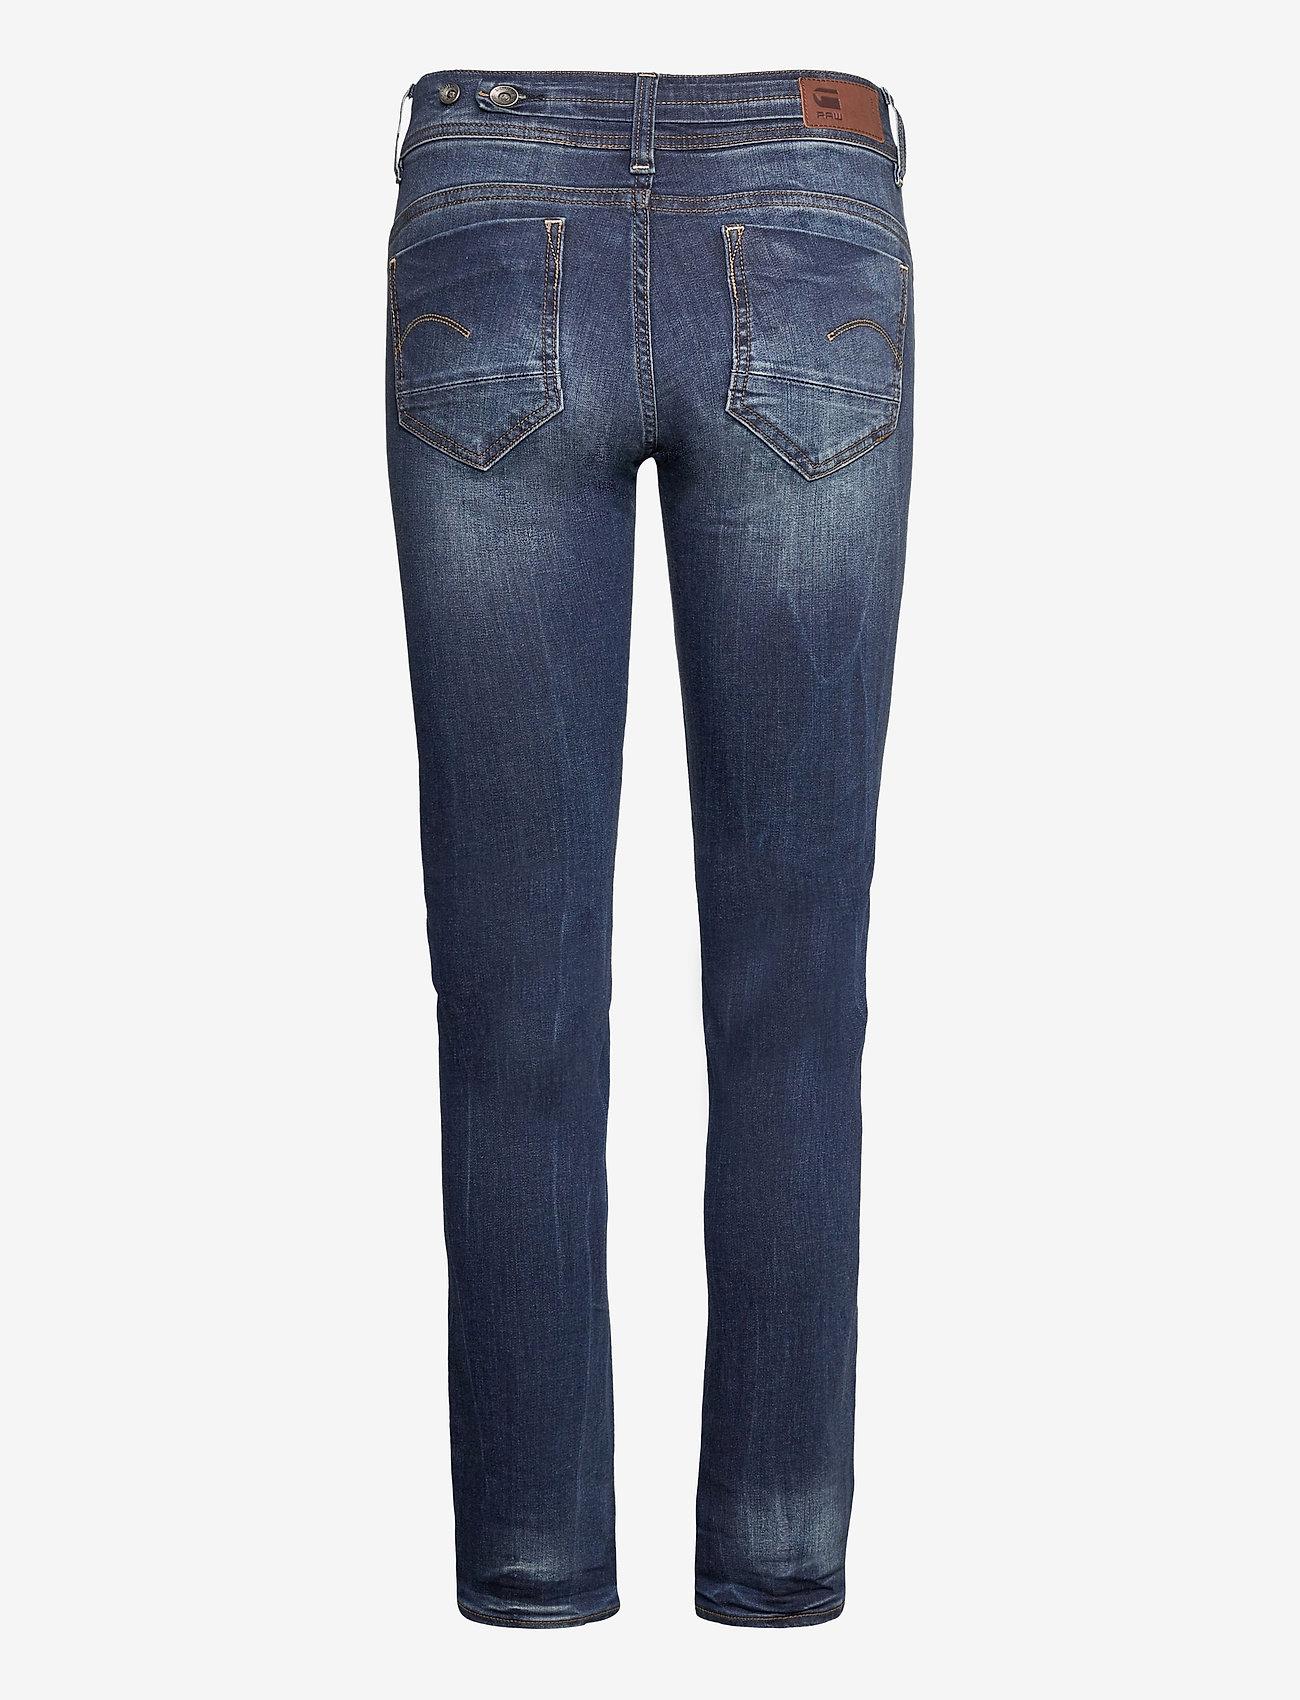 G-star RAW - Midge Mid Straight Wmn - straight jeans - dk aged - 1